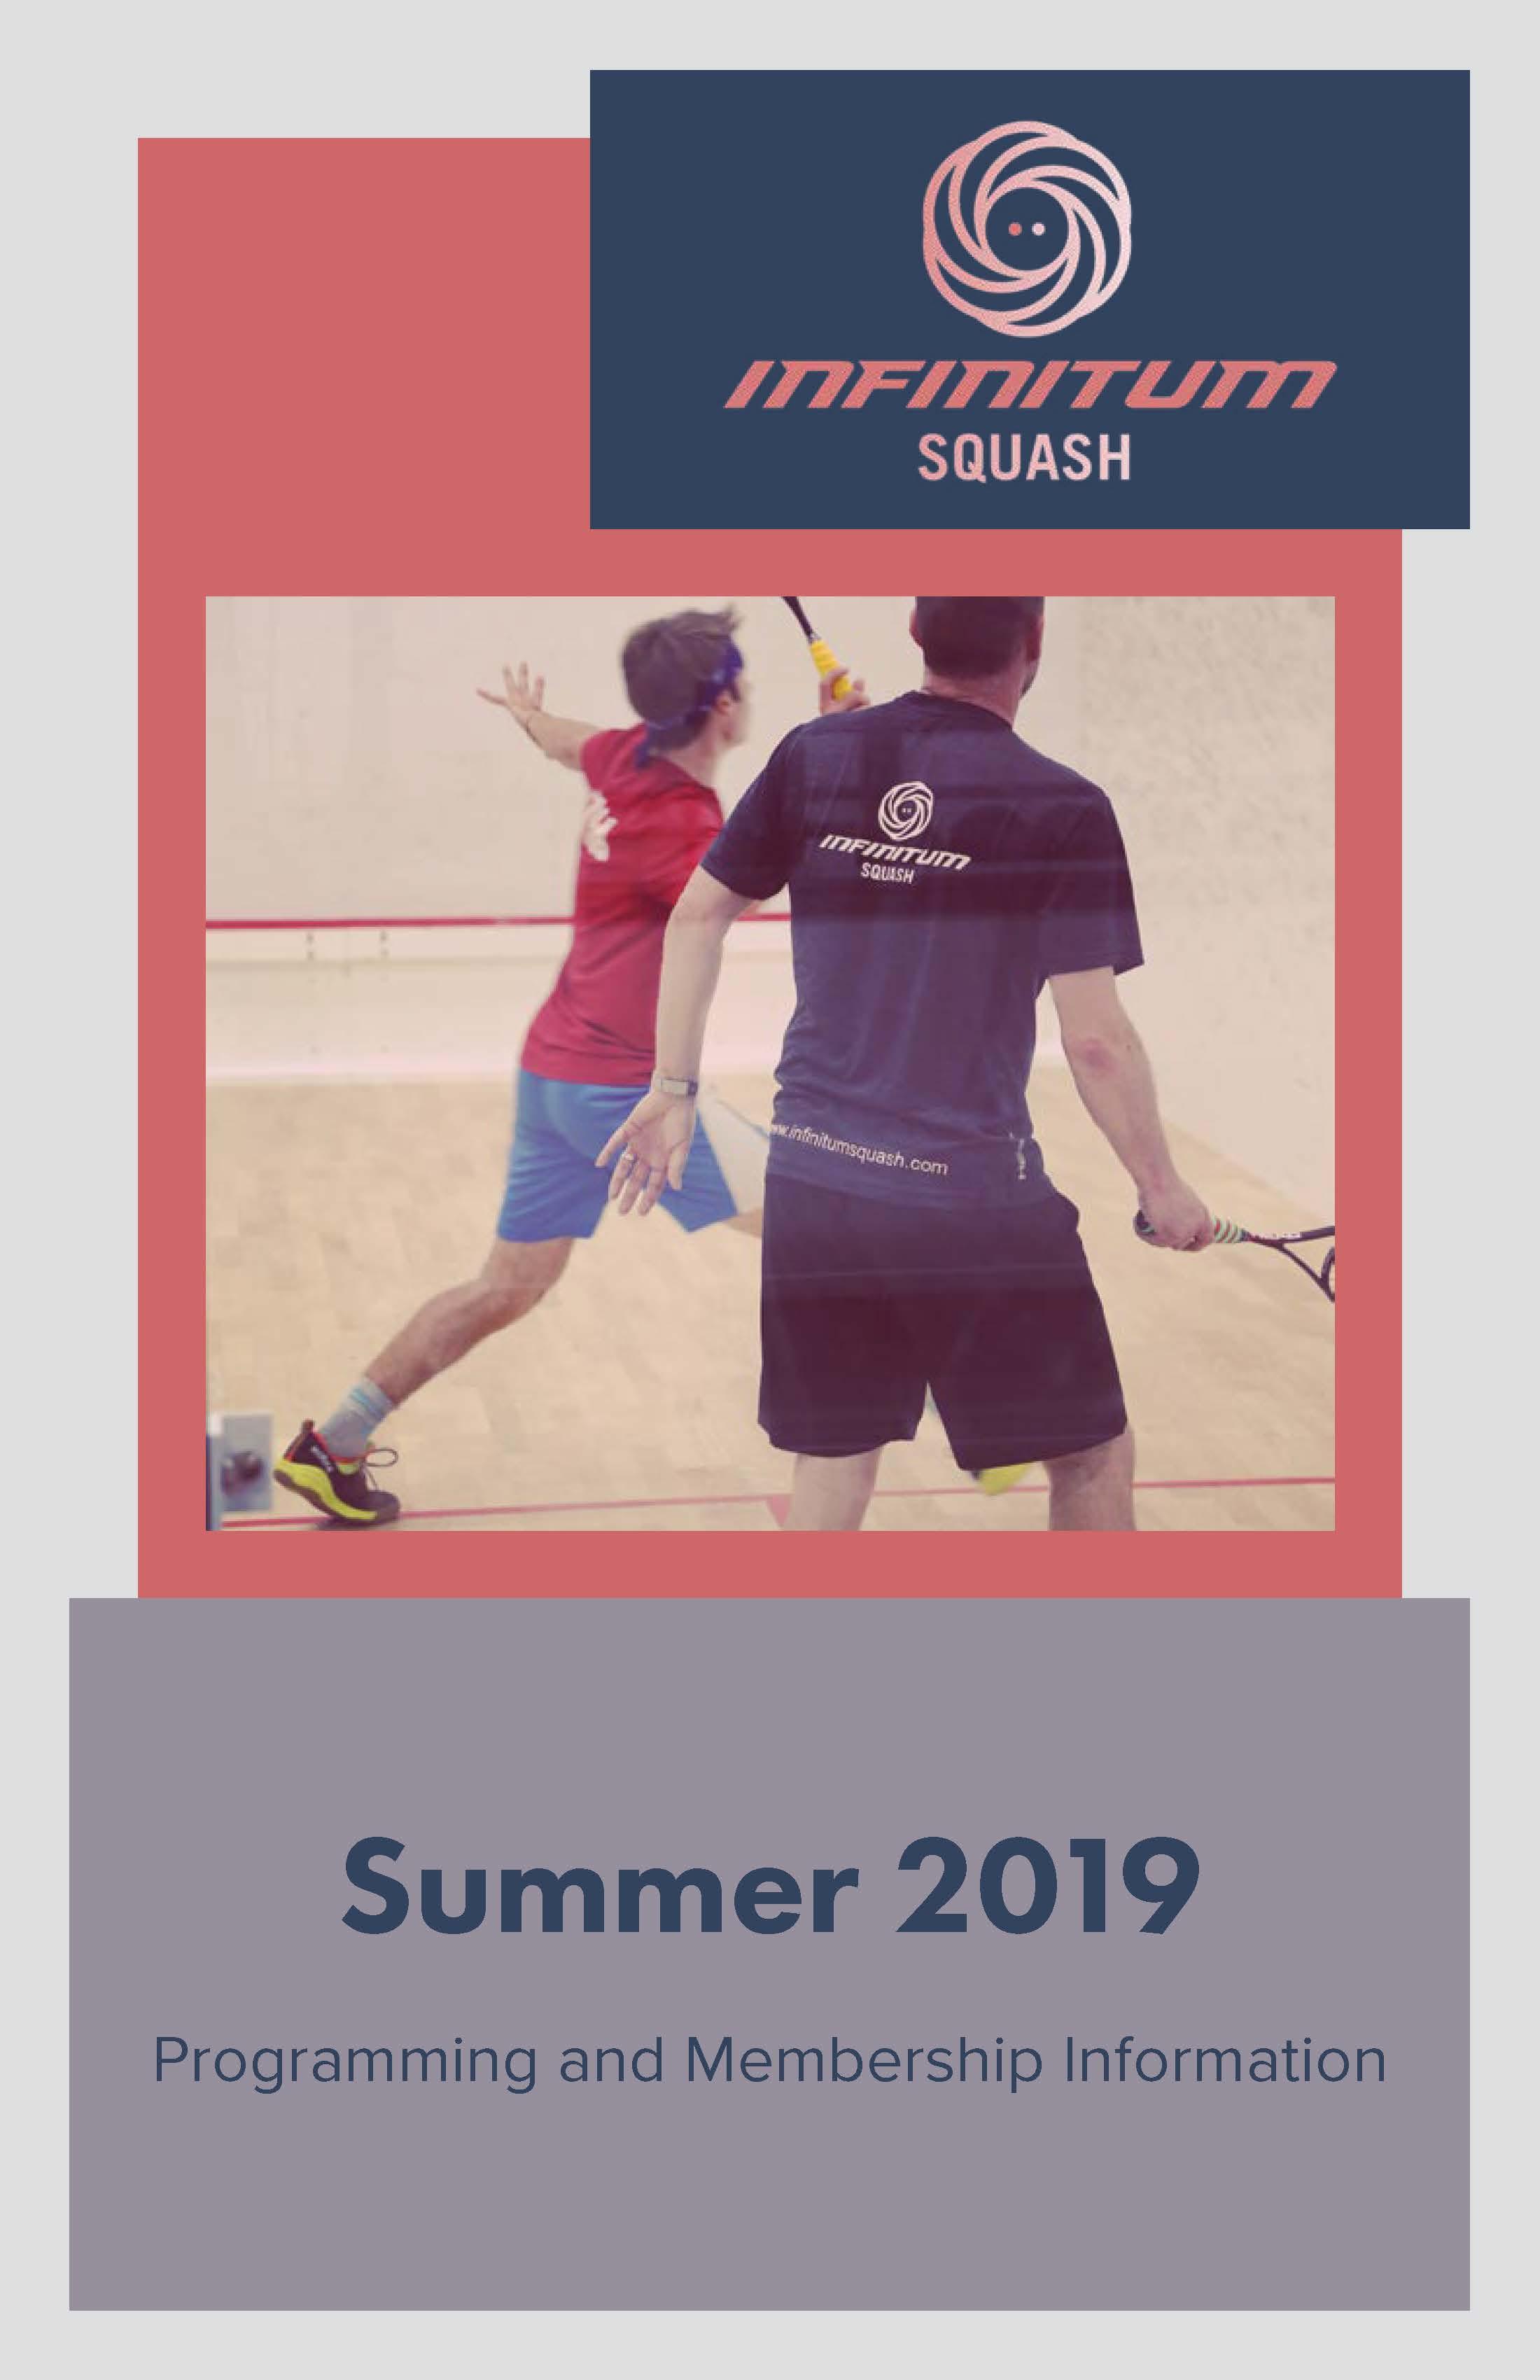 Cover - INFINITUM Squash - Summer 2019 Programming.jpg